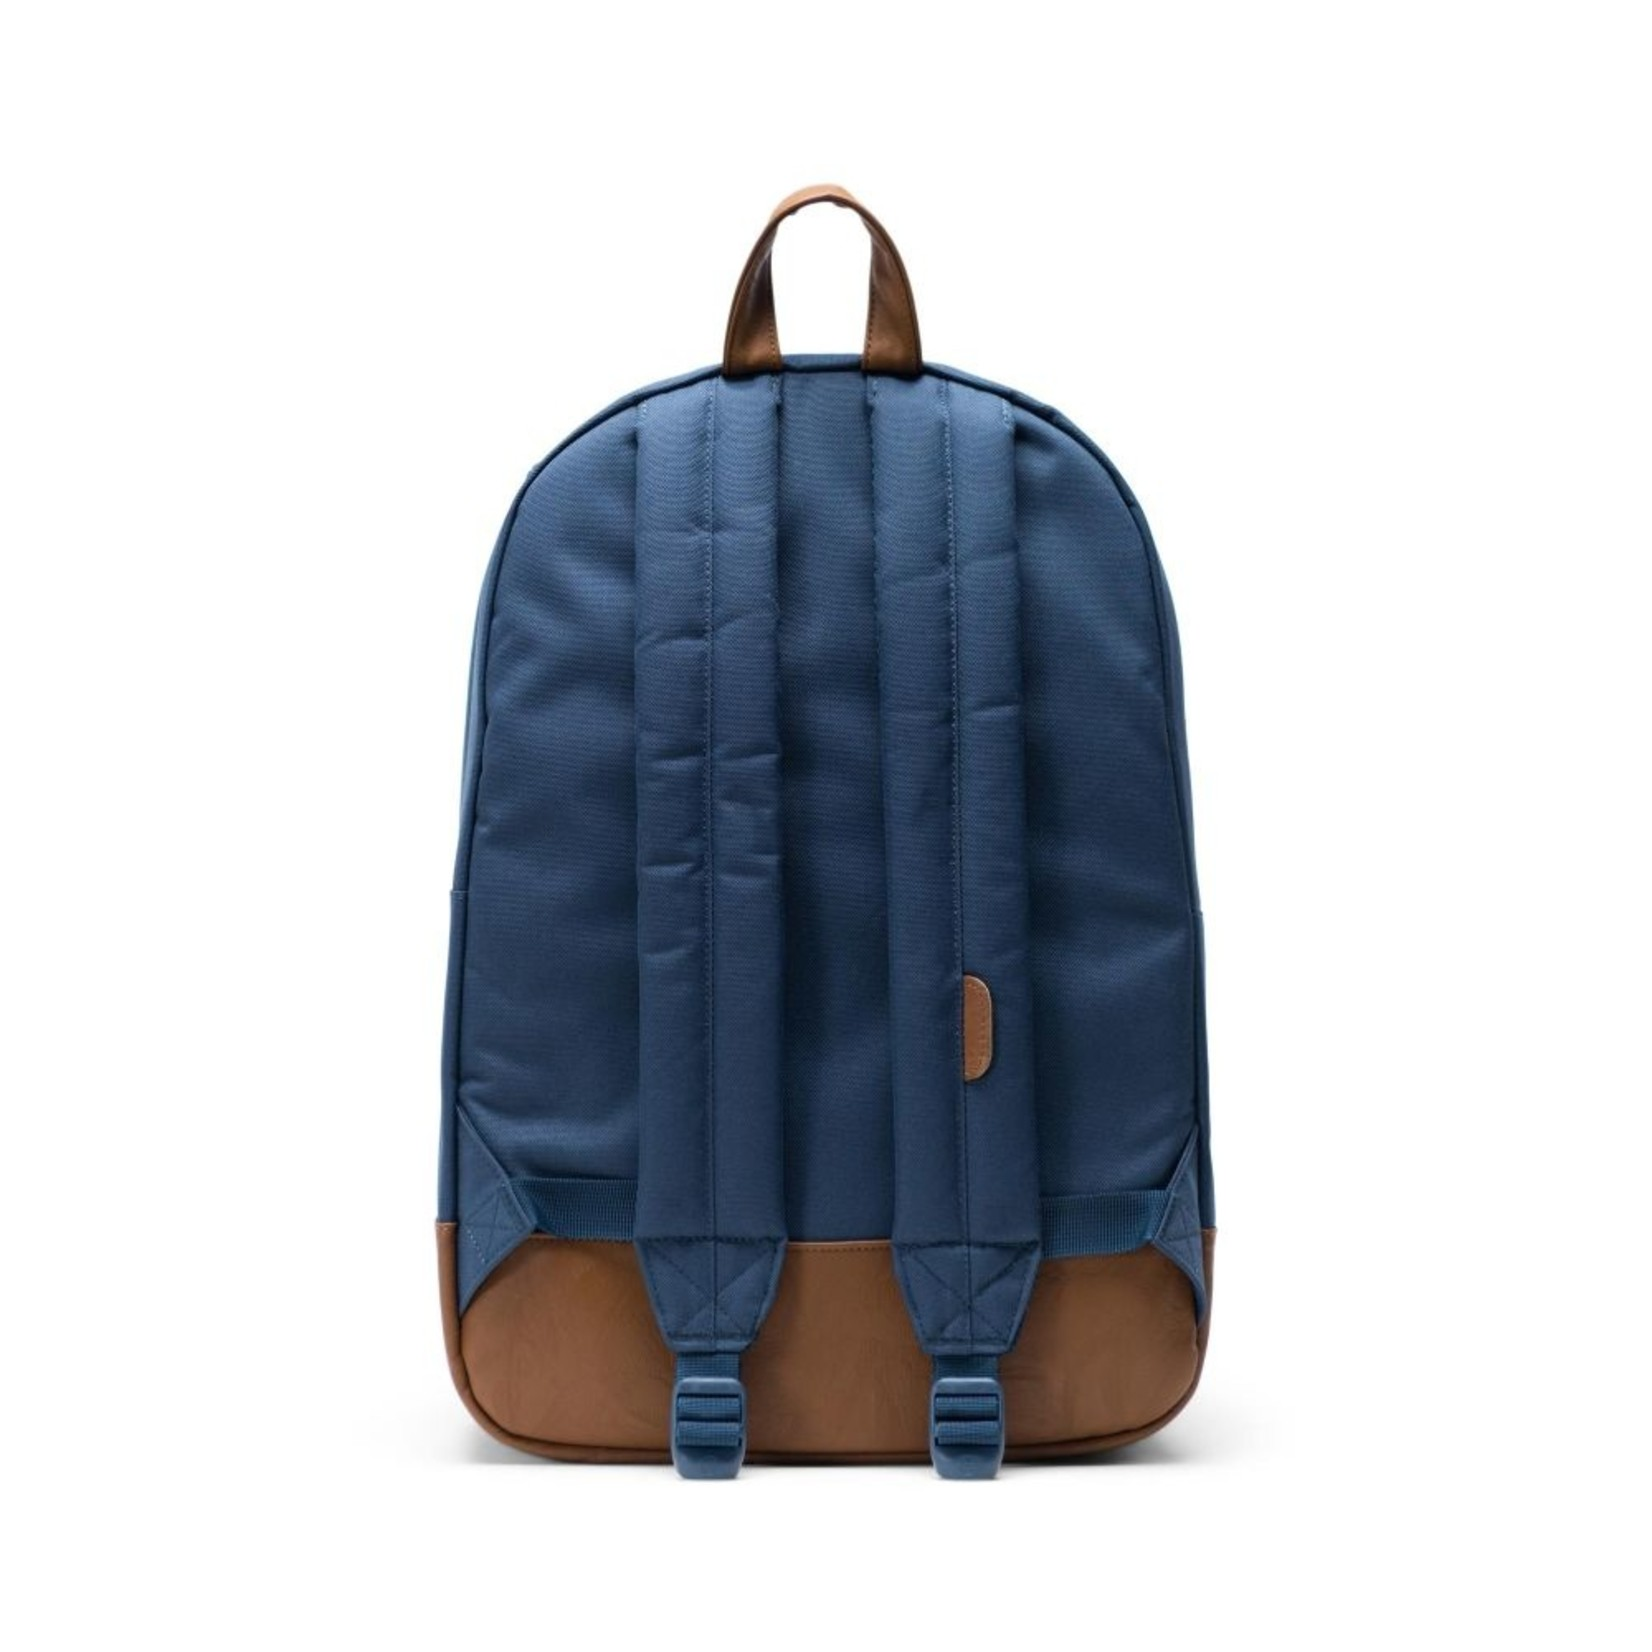 Herschel Heritage Navy/Tan Synthetic Leather